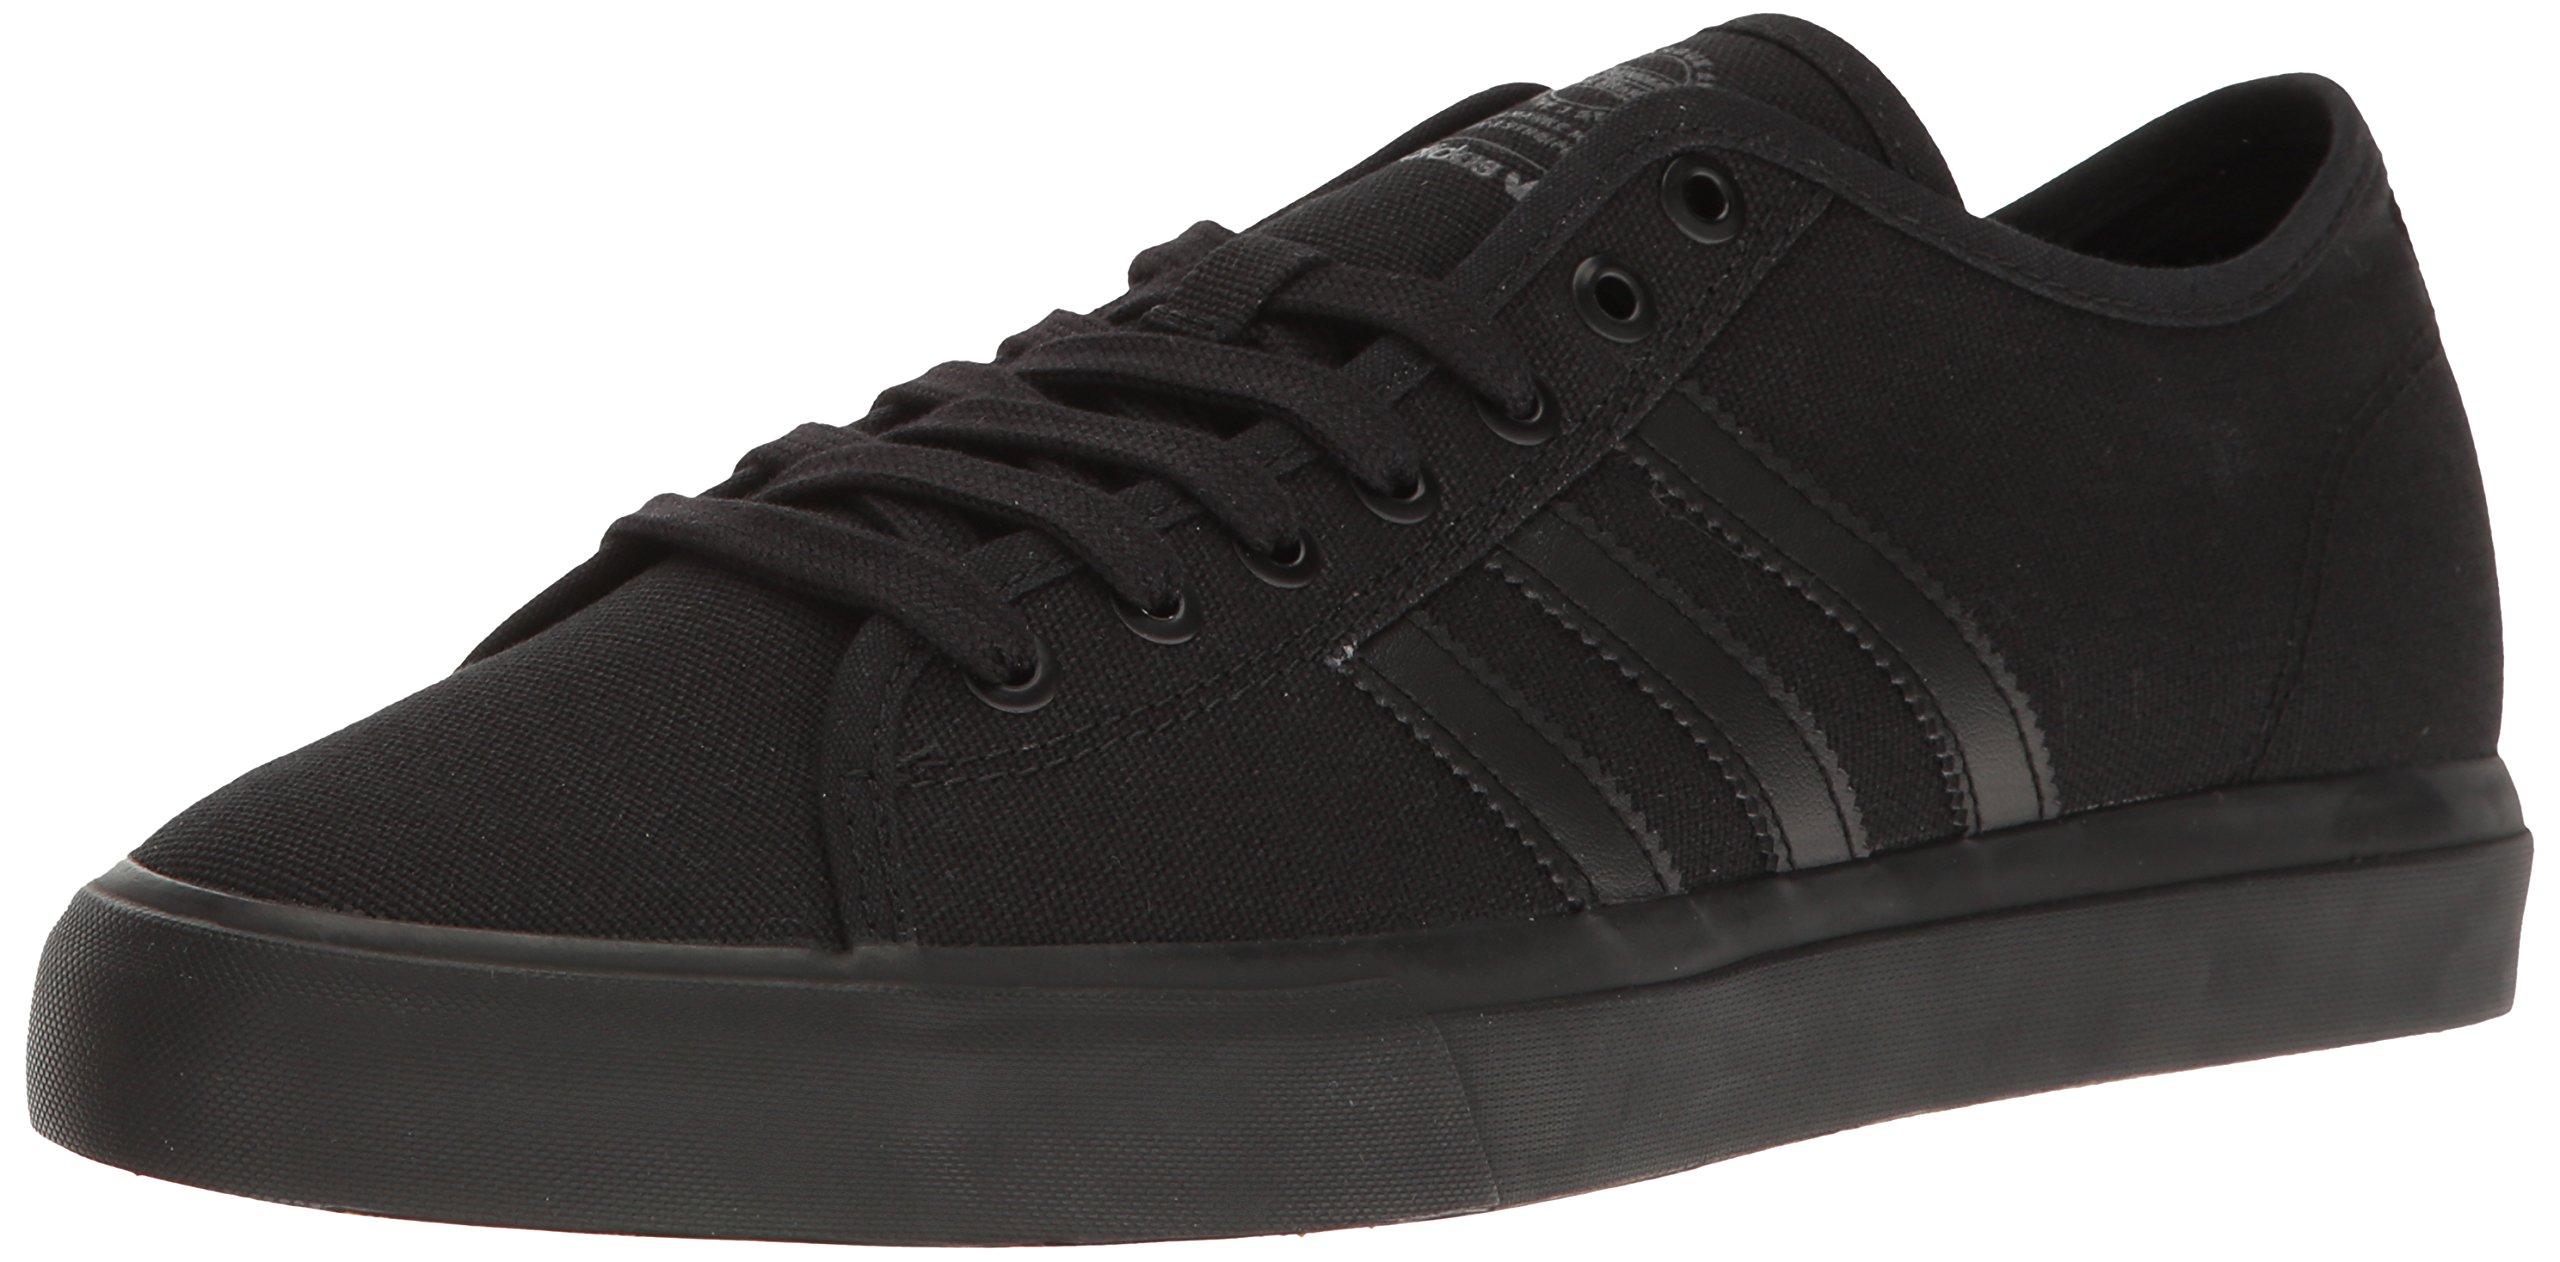 2739ae753db Galleon - Adidas Men s Matchcourt RX Shoes